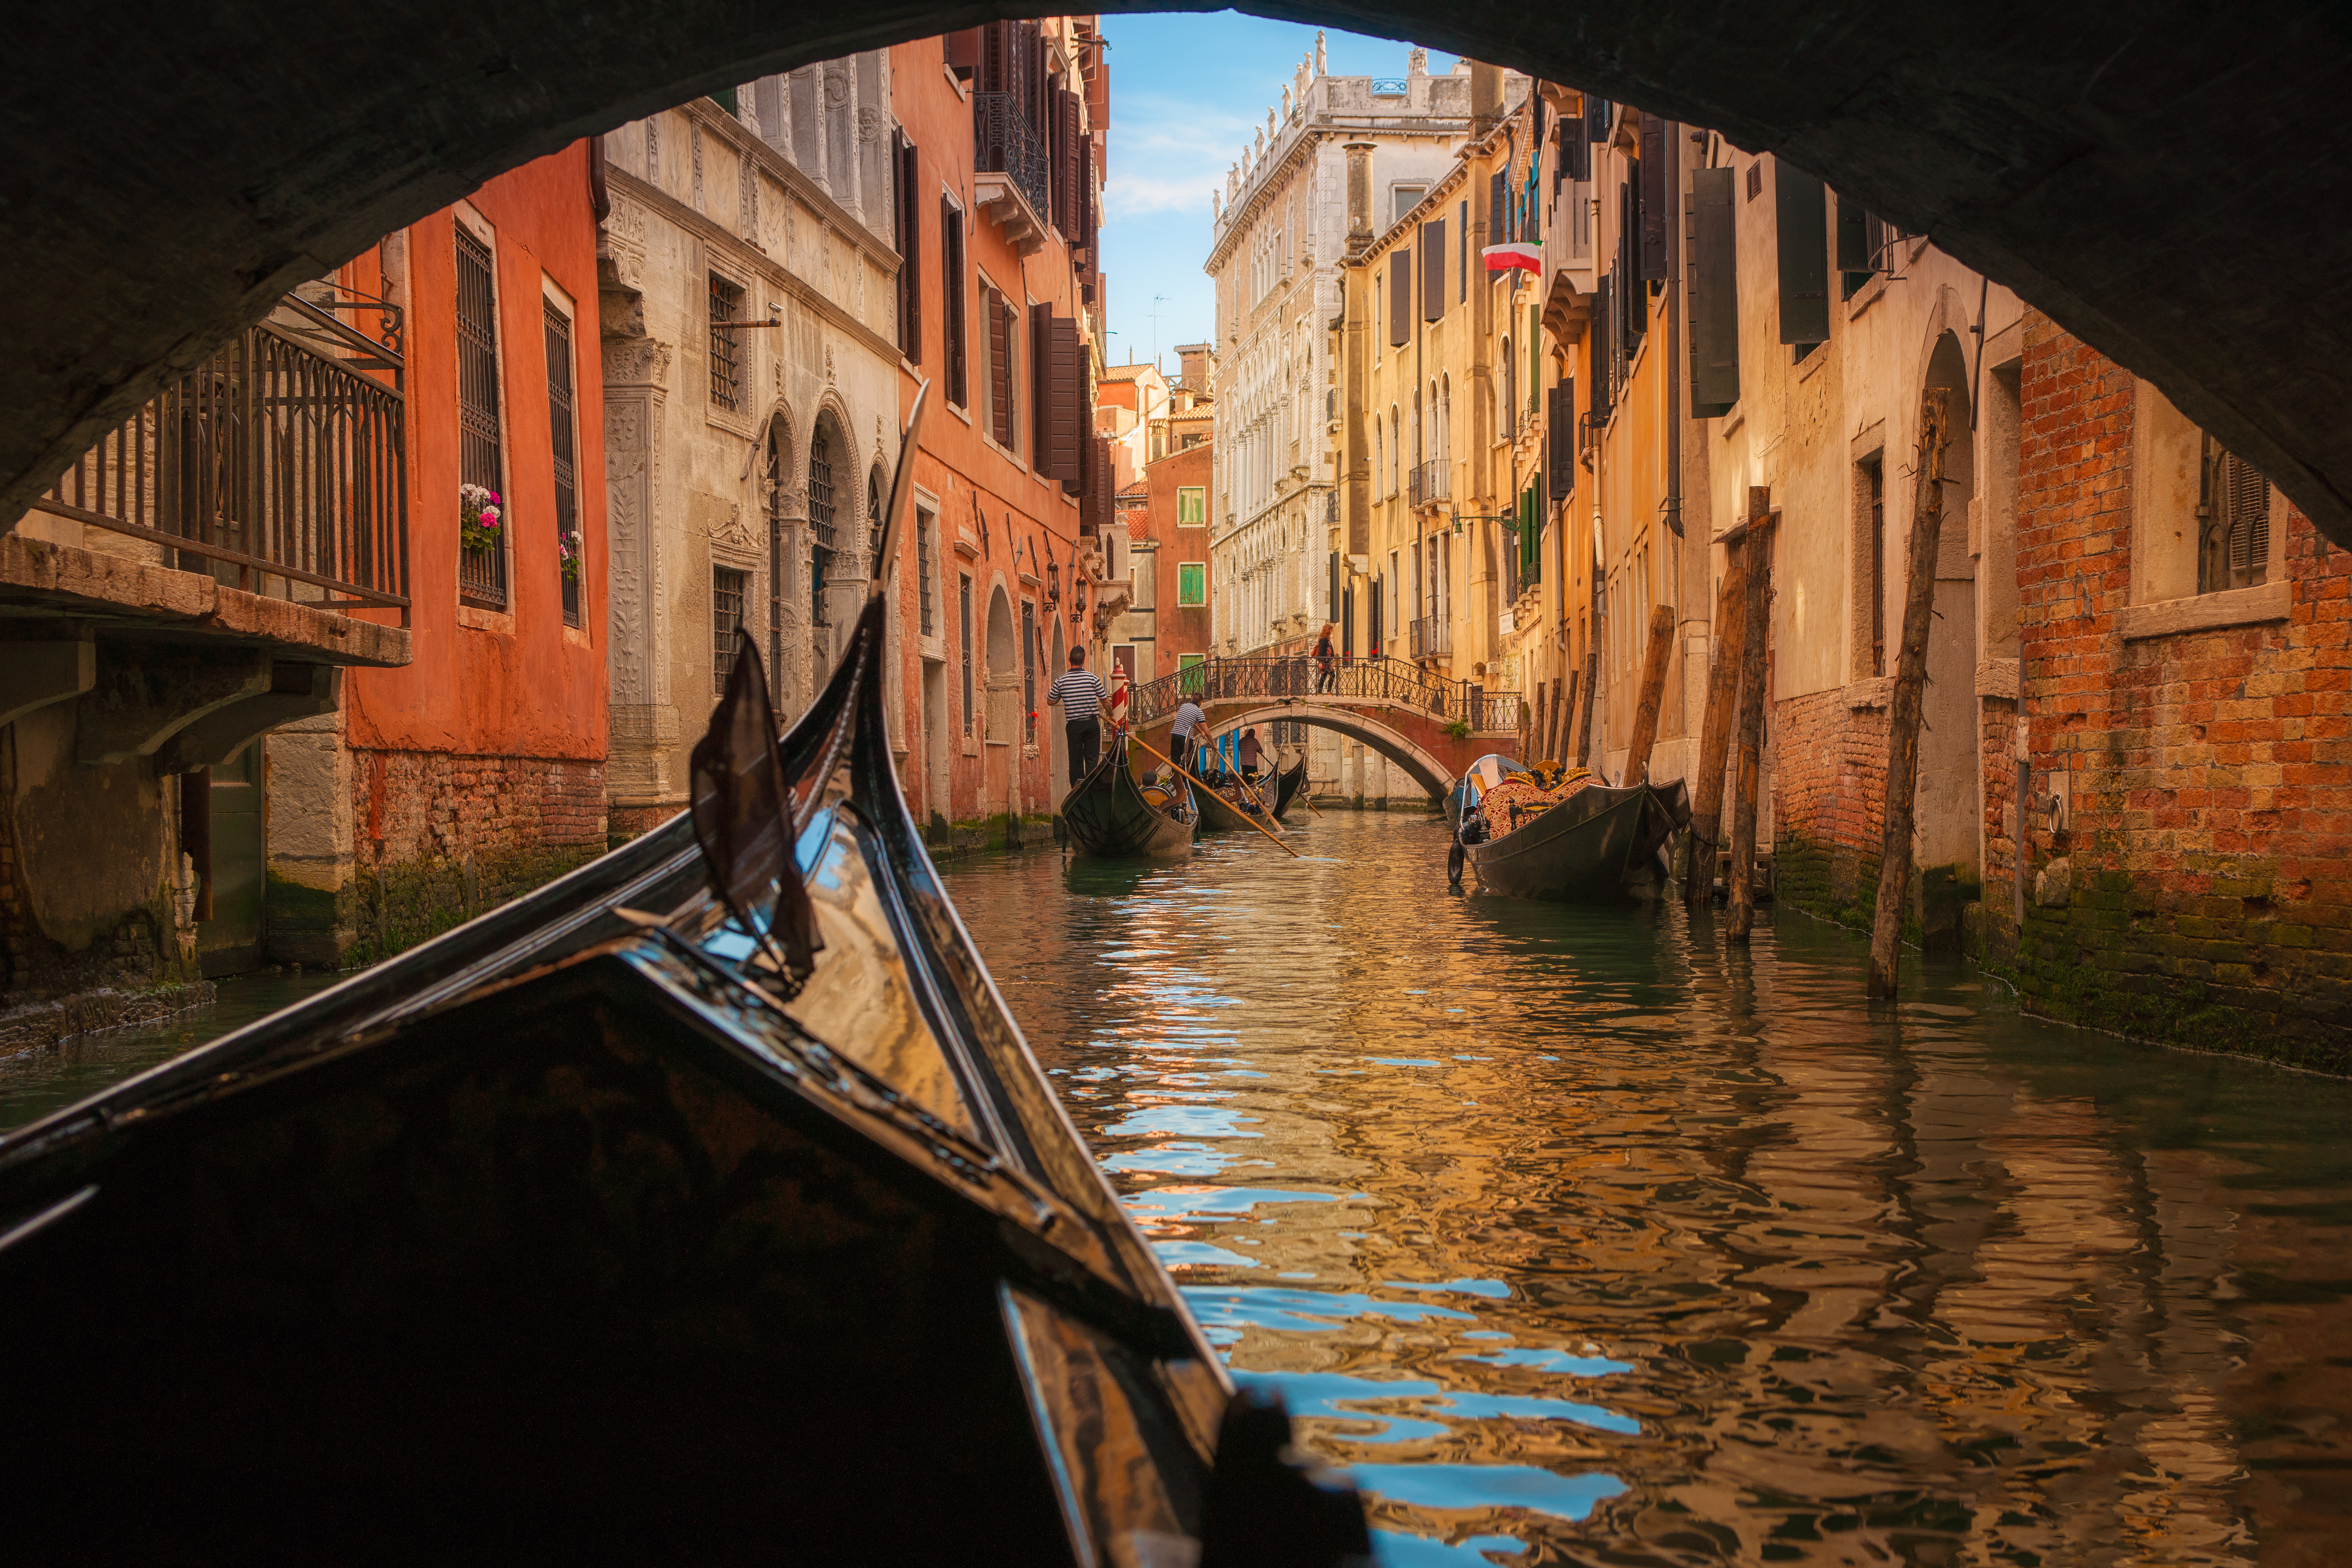 Italy, Veneto, Venice, Gondola under bridge